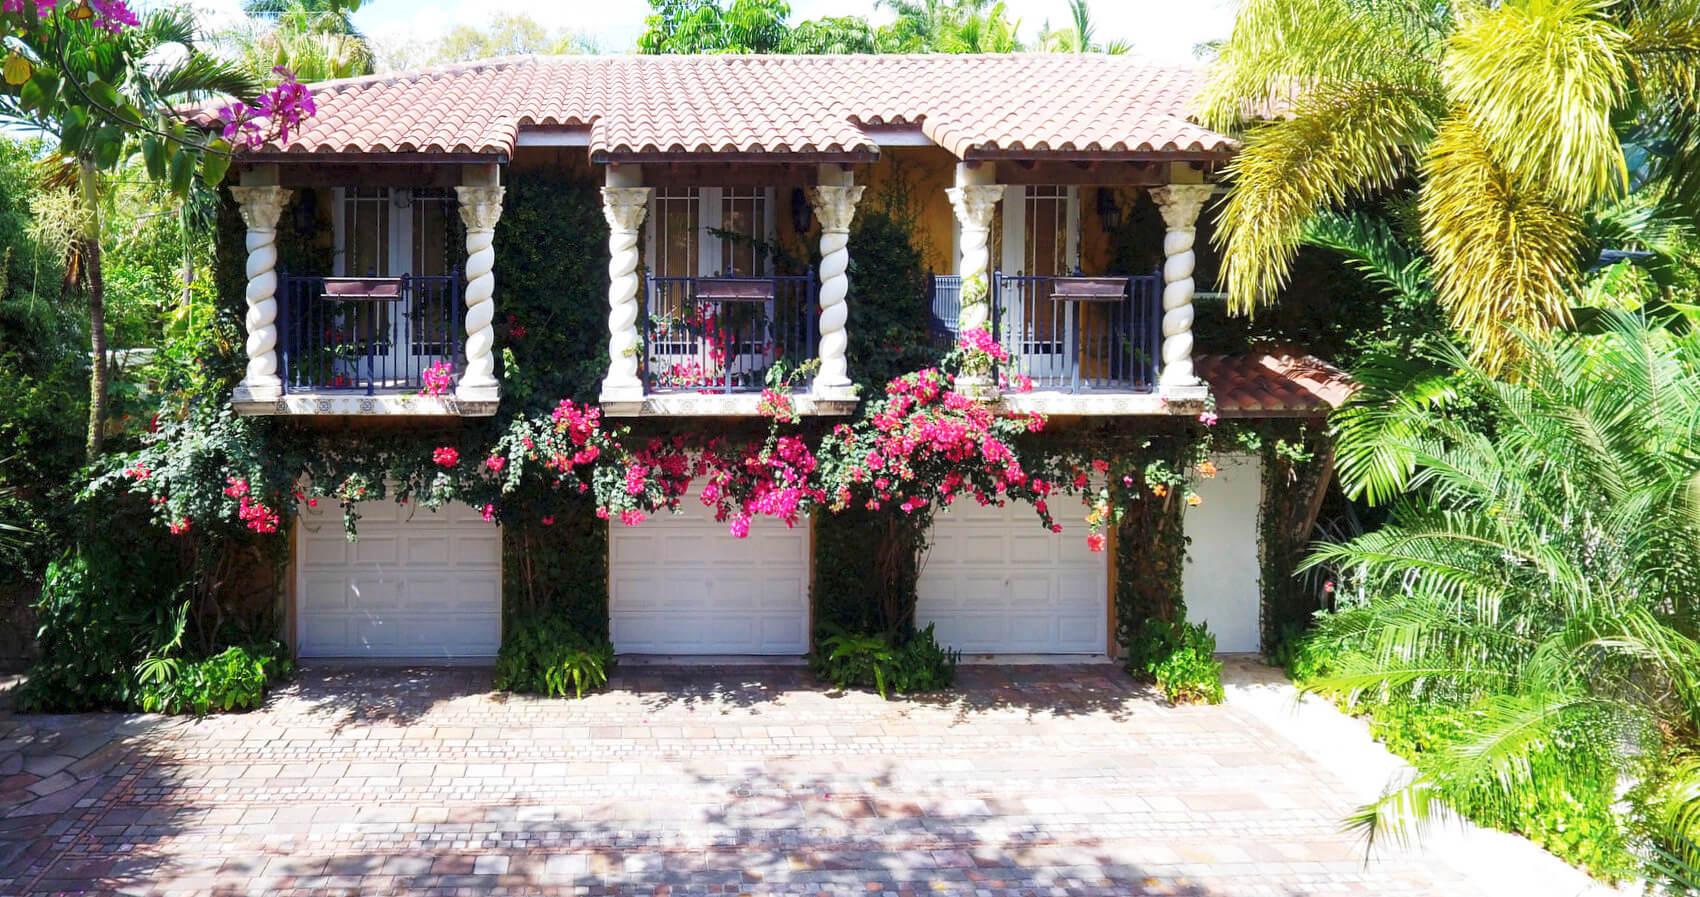 25__coconut_grove_aerial_photo_by_MiamiRealEstatePhotographers.com